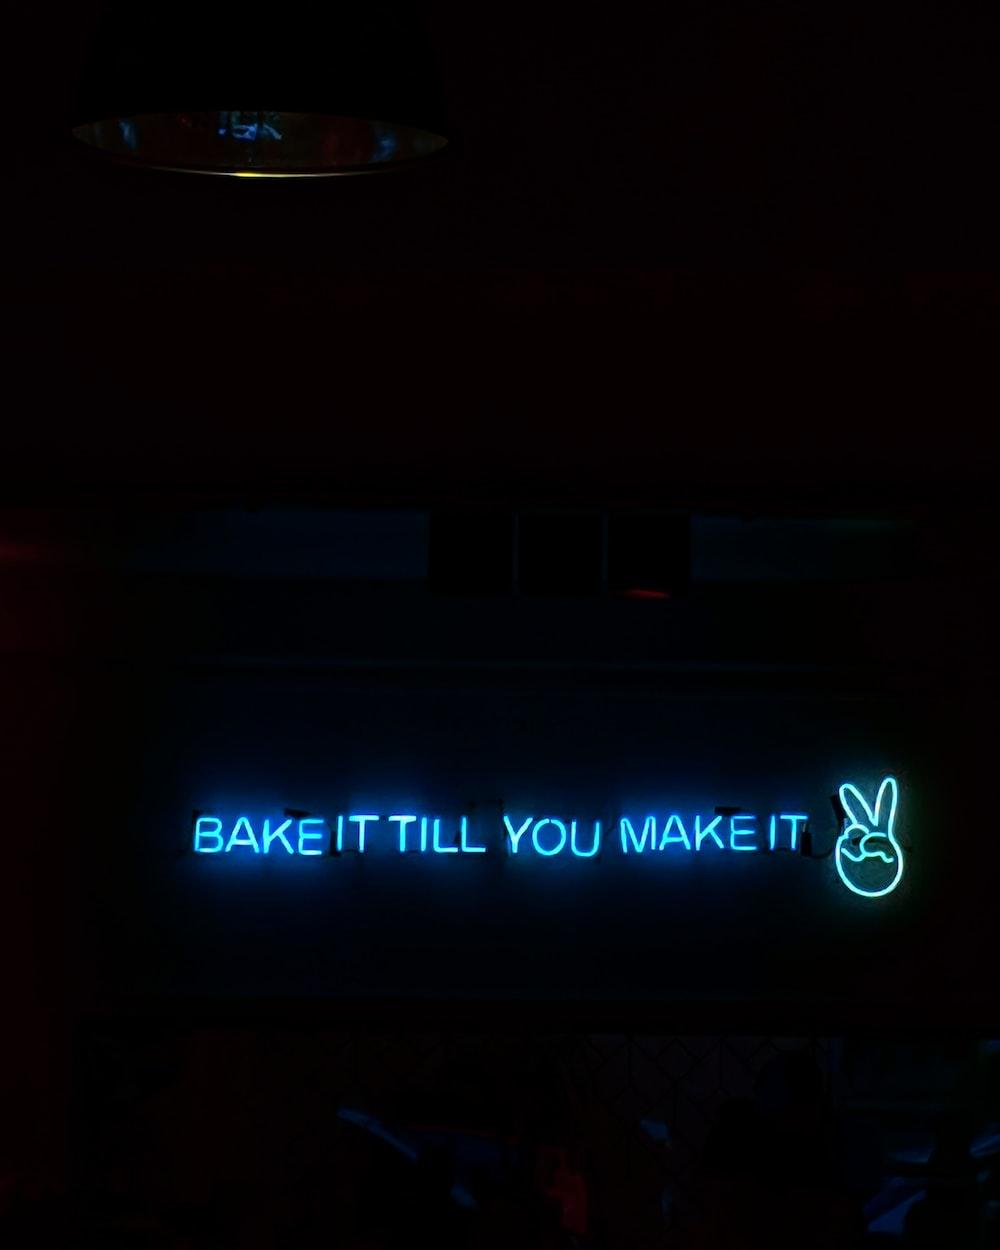 Bakt it till you make it neon signage light